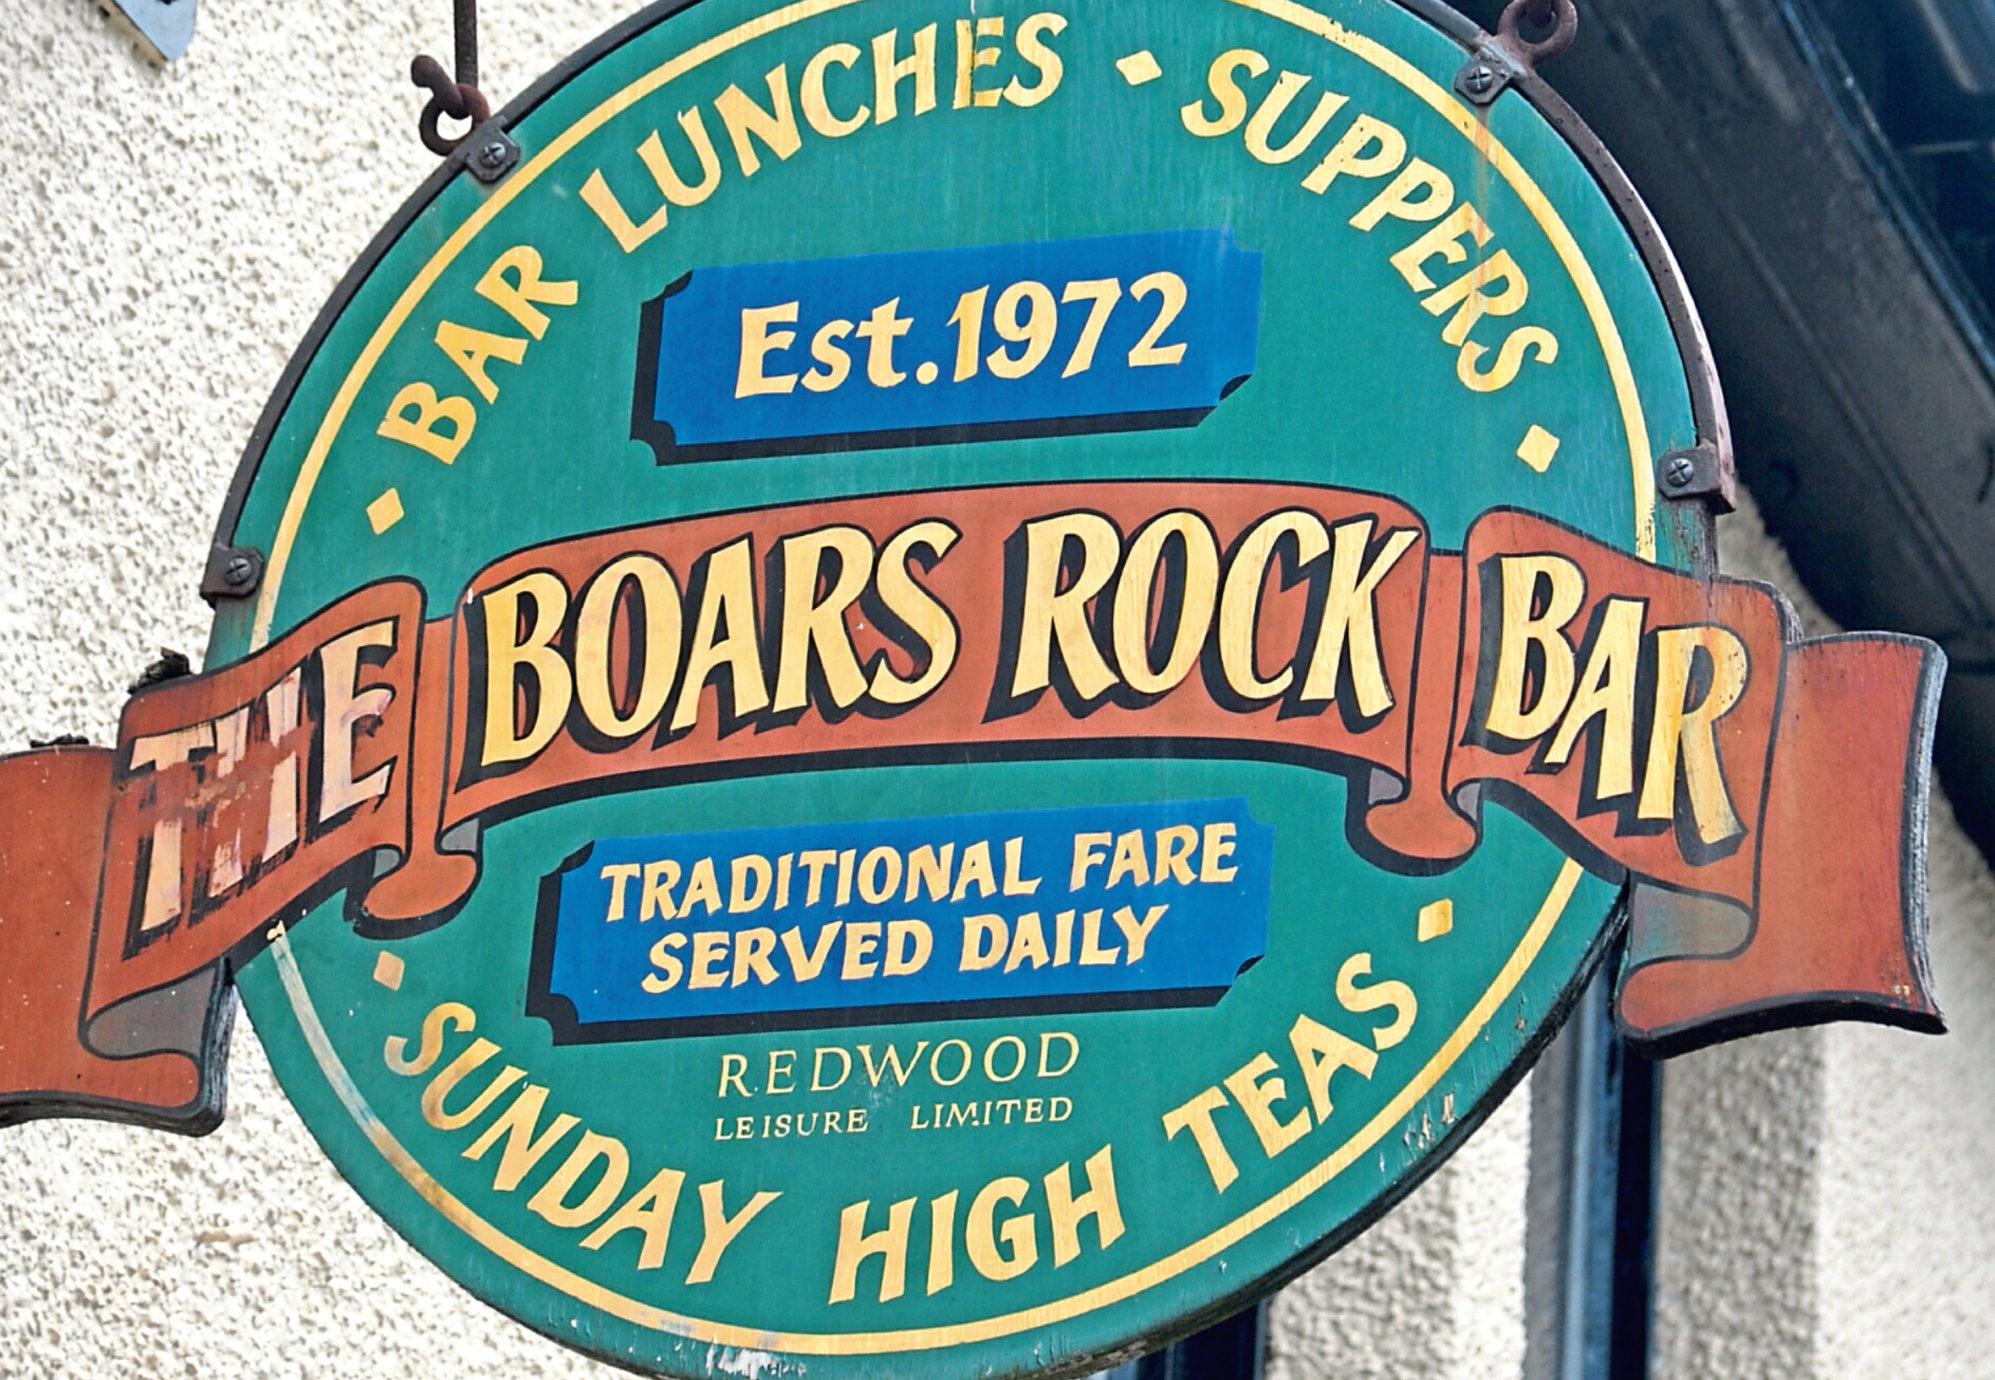 Boars Rock in Arbroath Road, Dundee